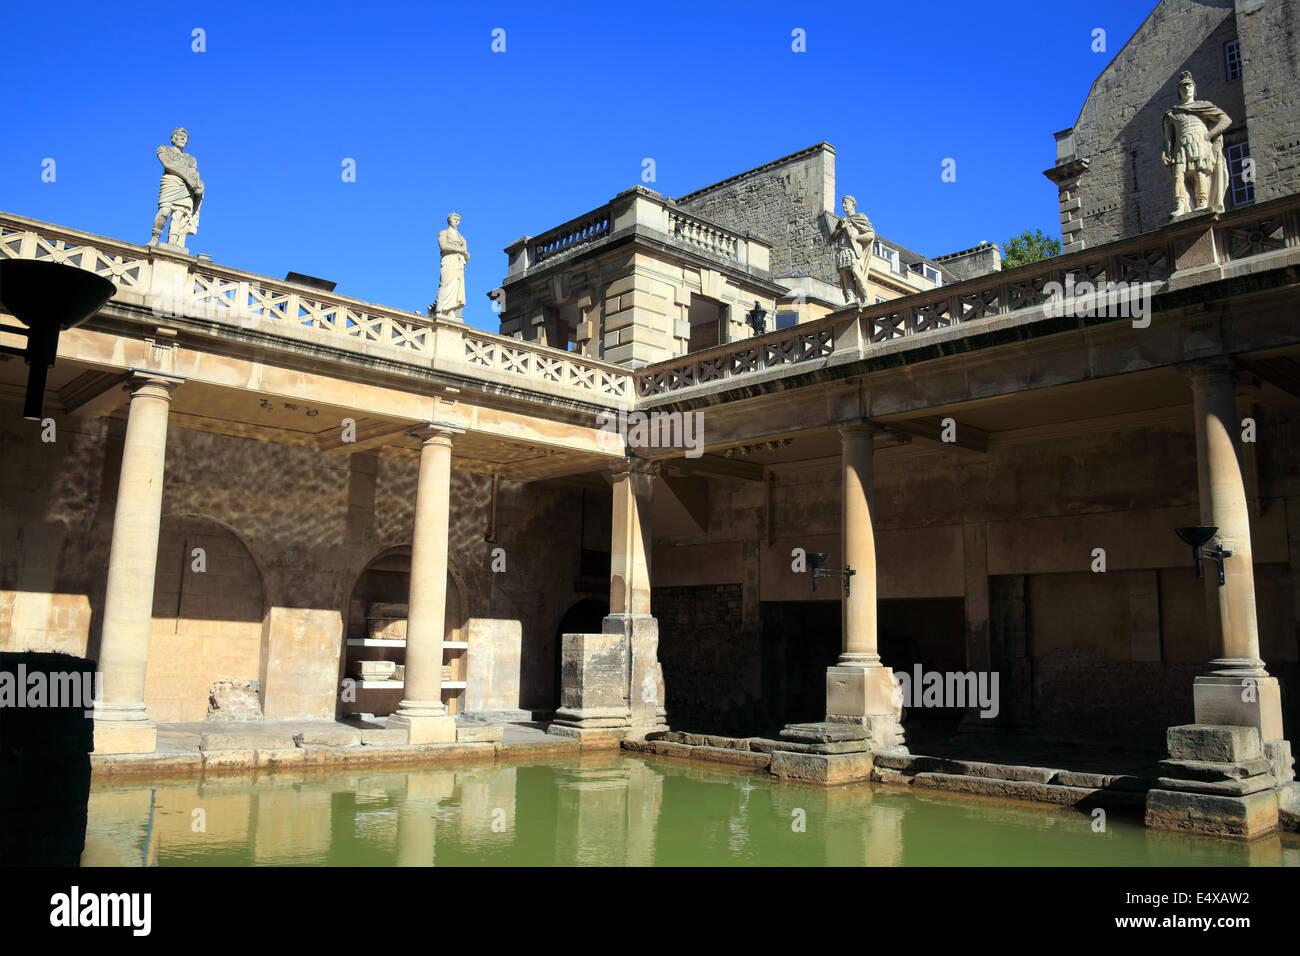 The Roman Baths in Bath, Somerset, England - Stock Image